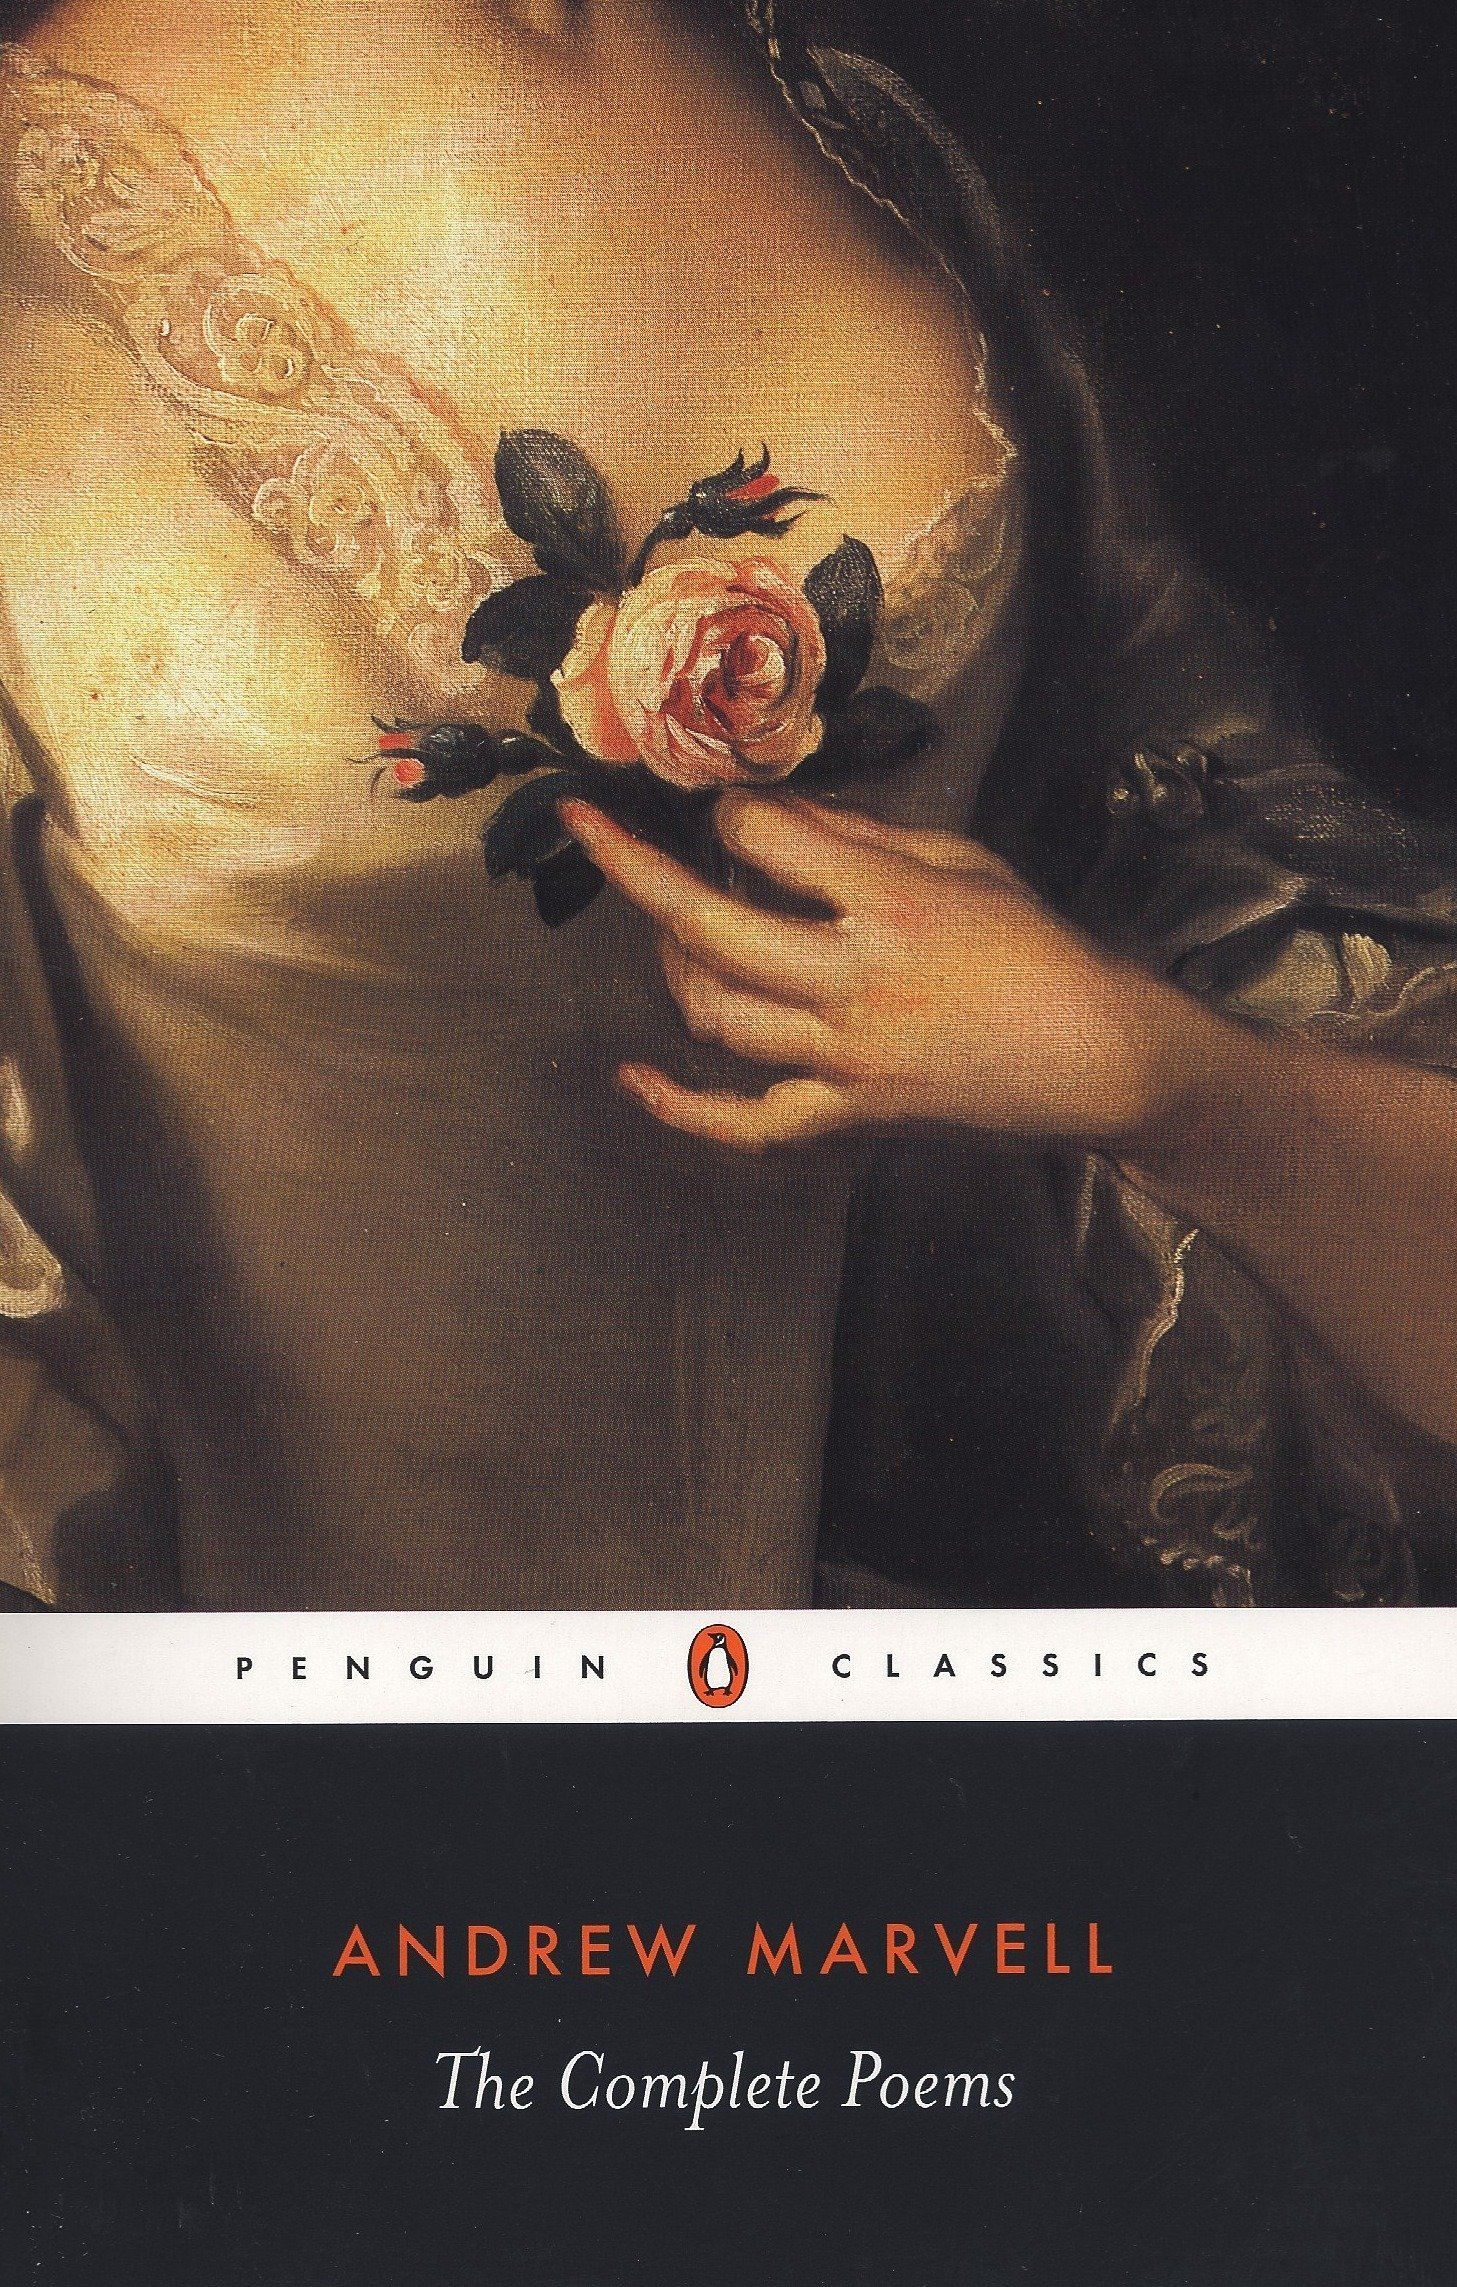 The Complete Poems (Penguin Classics): Andrew Marvell, Elizabeth Story  Donno, Jonathan Bate: 9780140424577: Amazon.com: Books